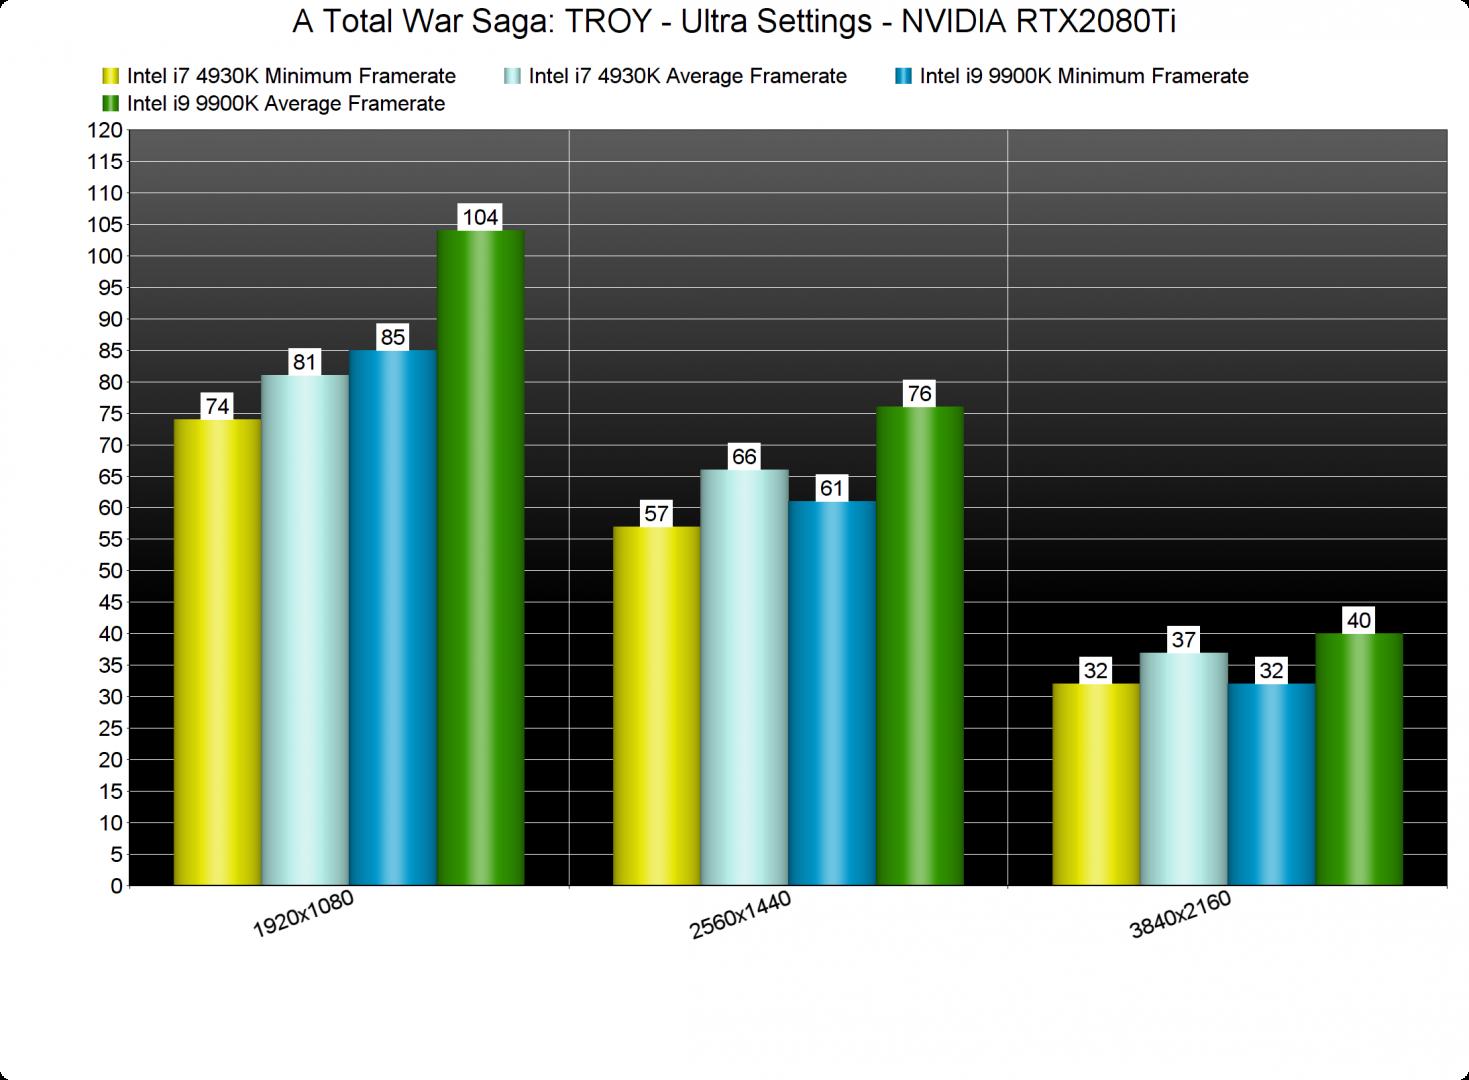 A Total War Saga TROY CPU benchmarks-2